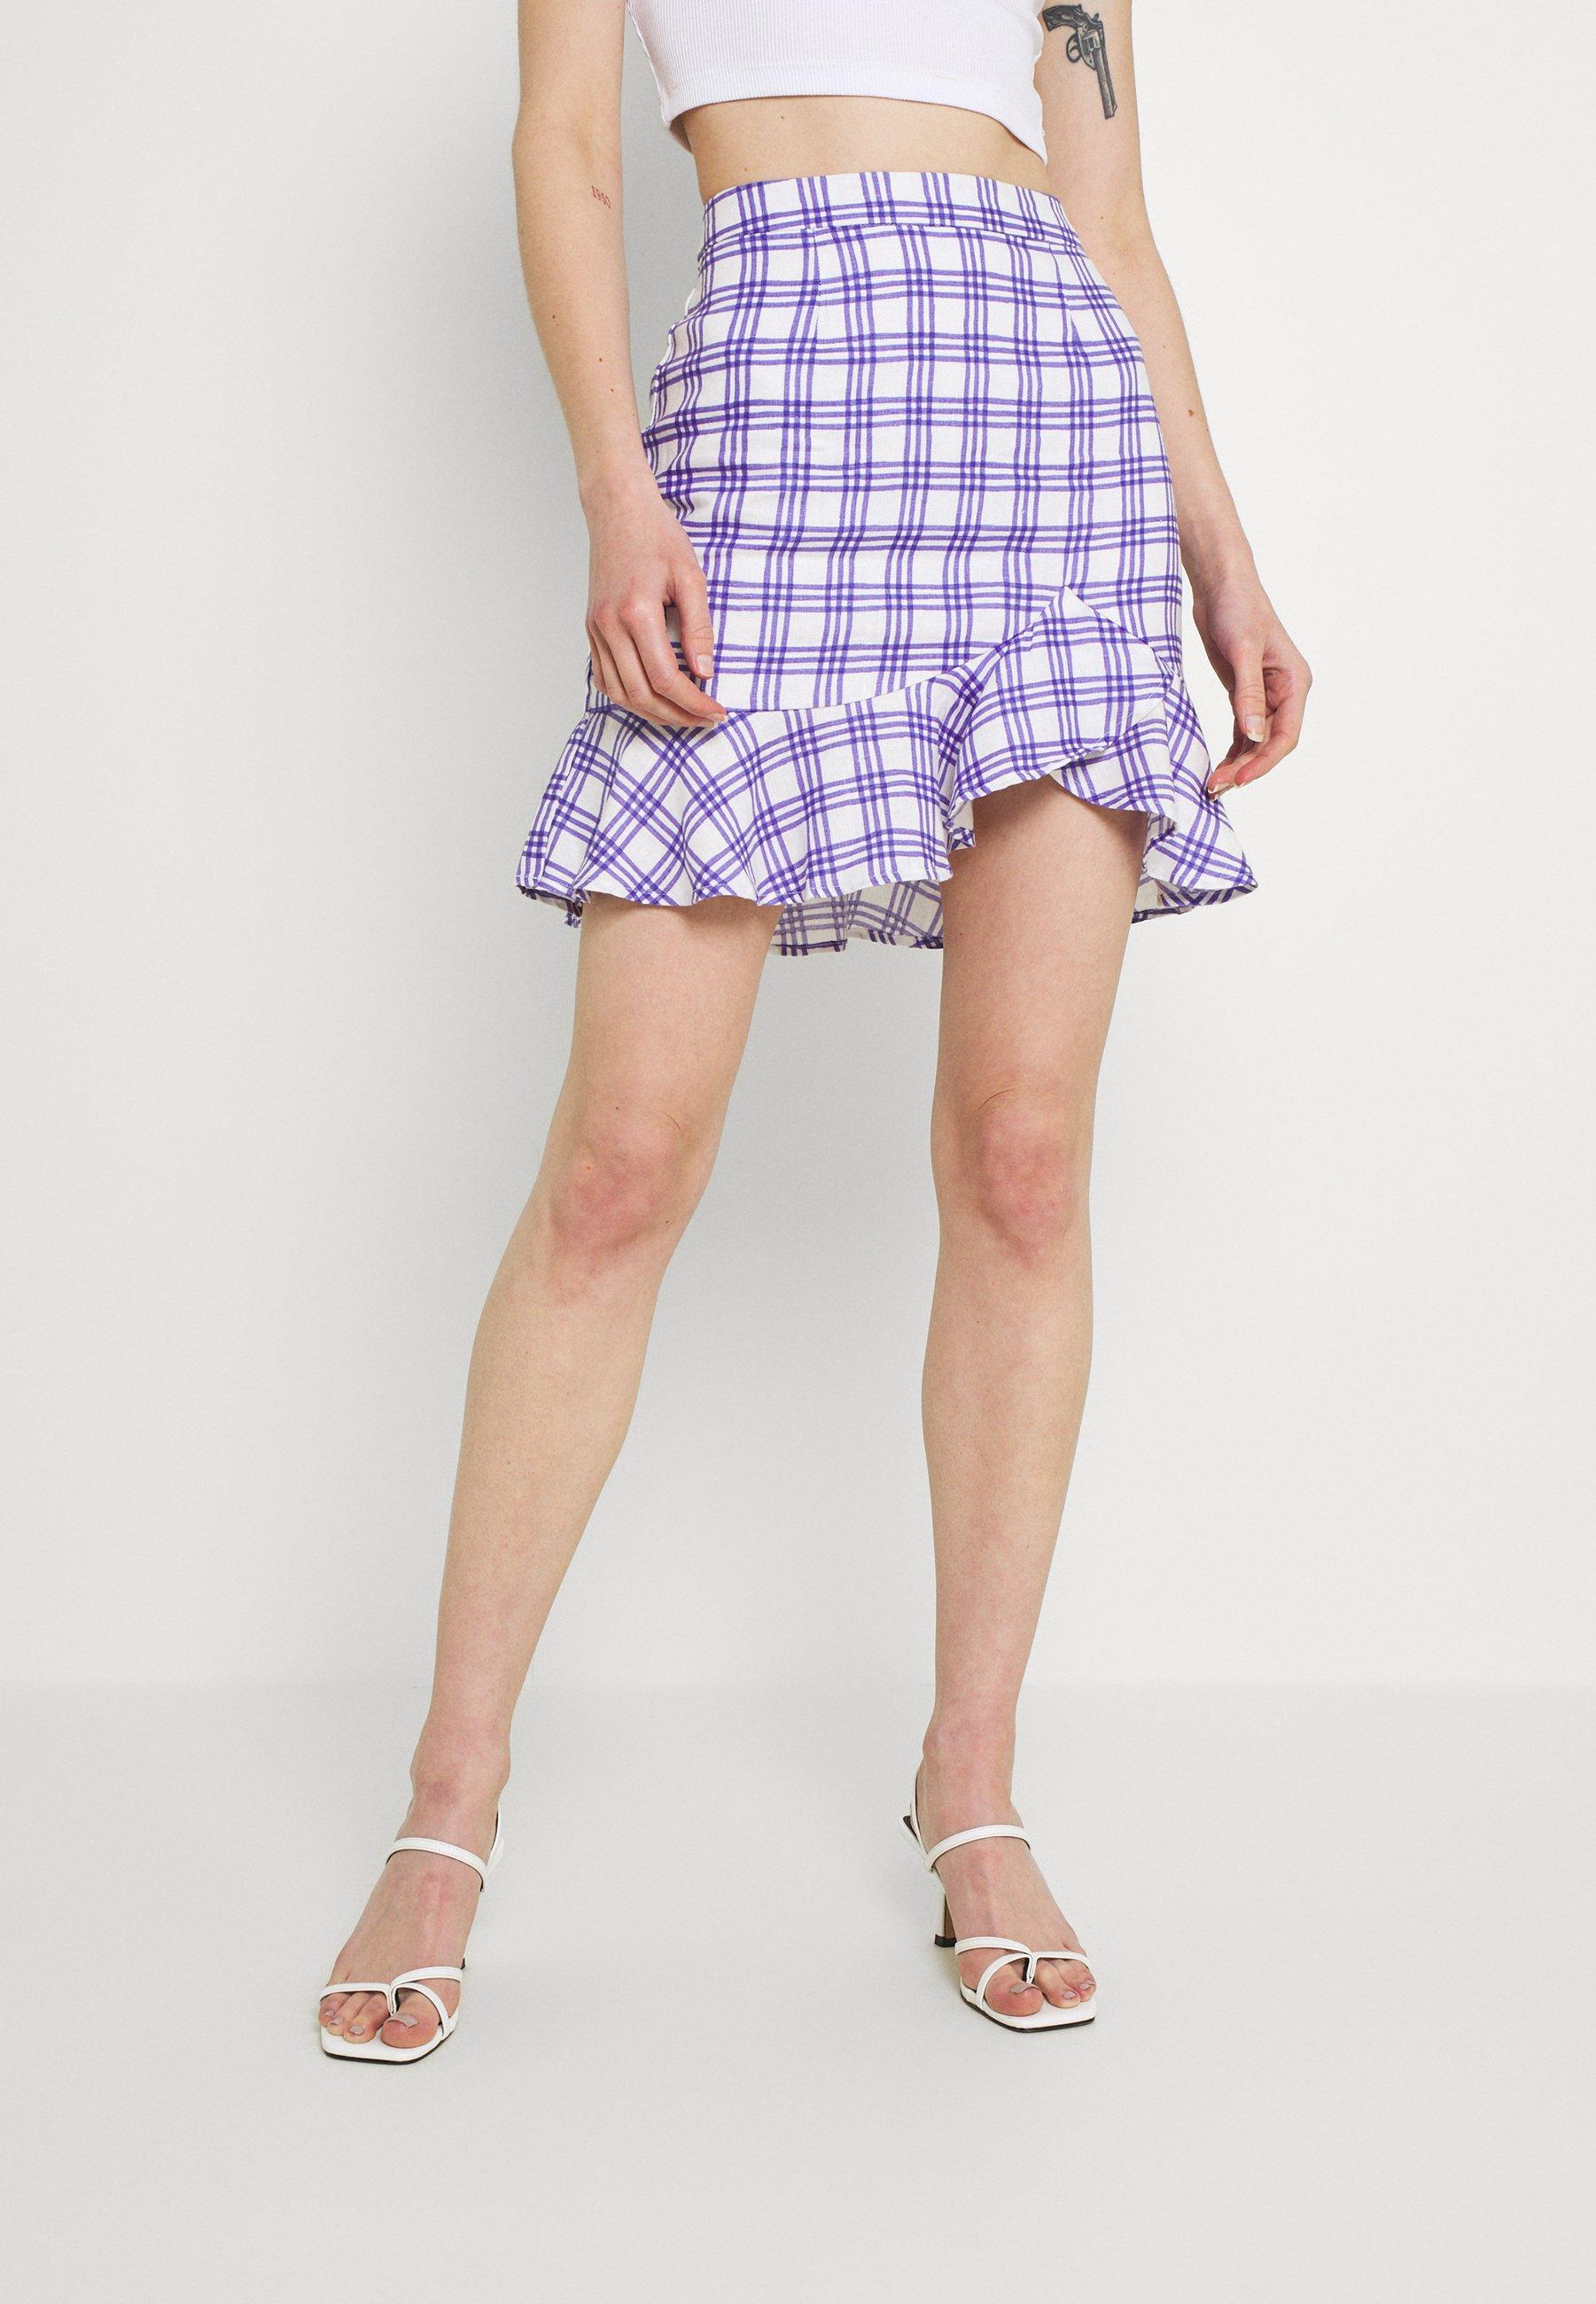 Femme BOTTOM FLOUNCE MINI SKIRT - Minijupe